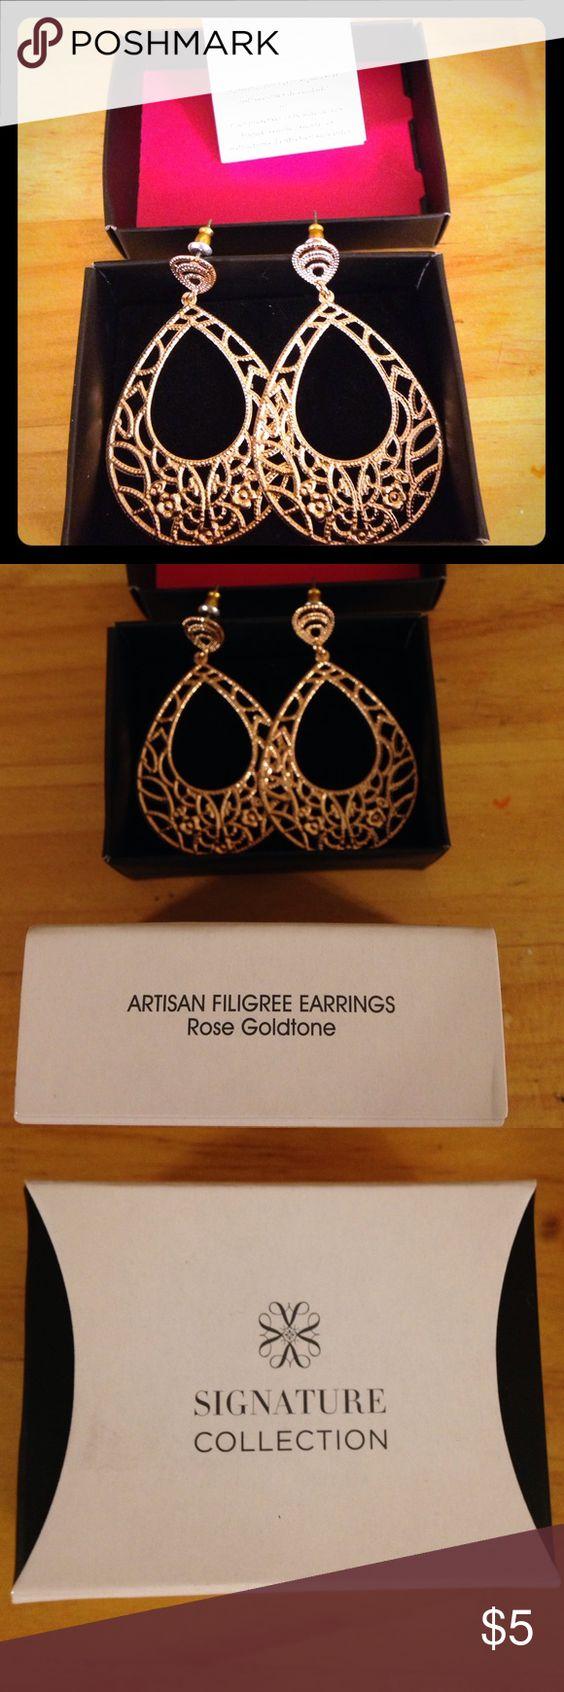 "Artisan Filigree Earrings Rose gold tone filigree earrings, post style. 2 3/8"" long. Avon. New in original box. Avon Jewelry Earrings"